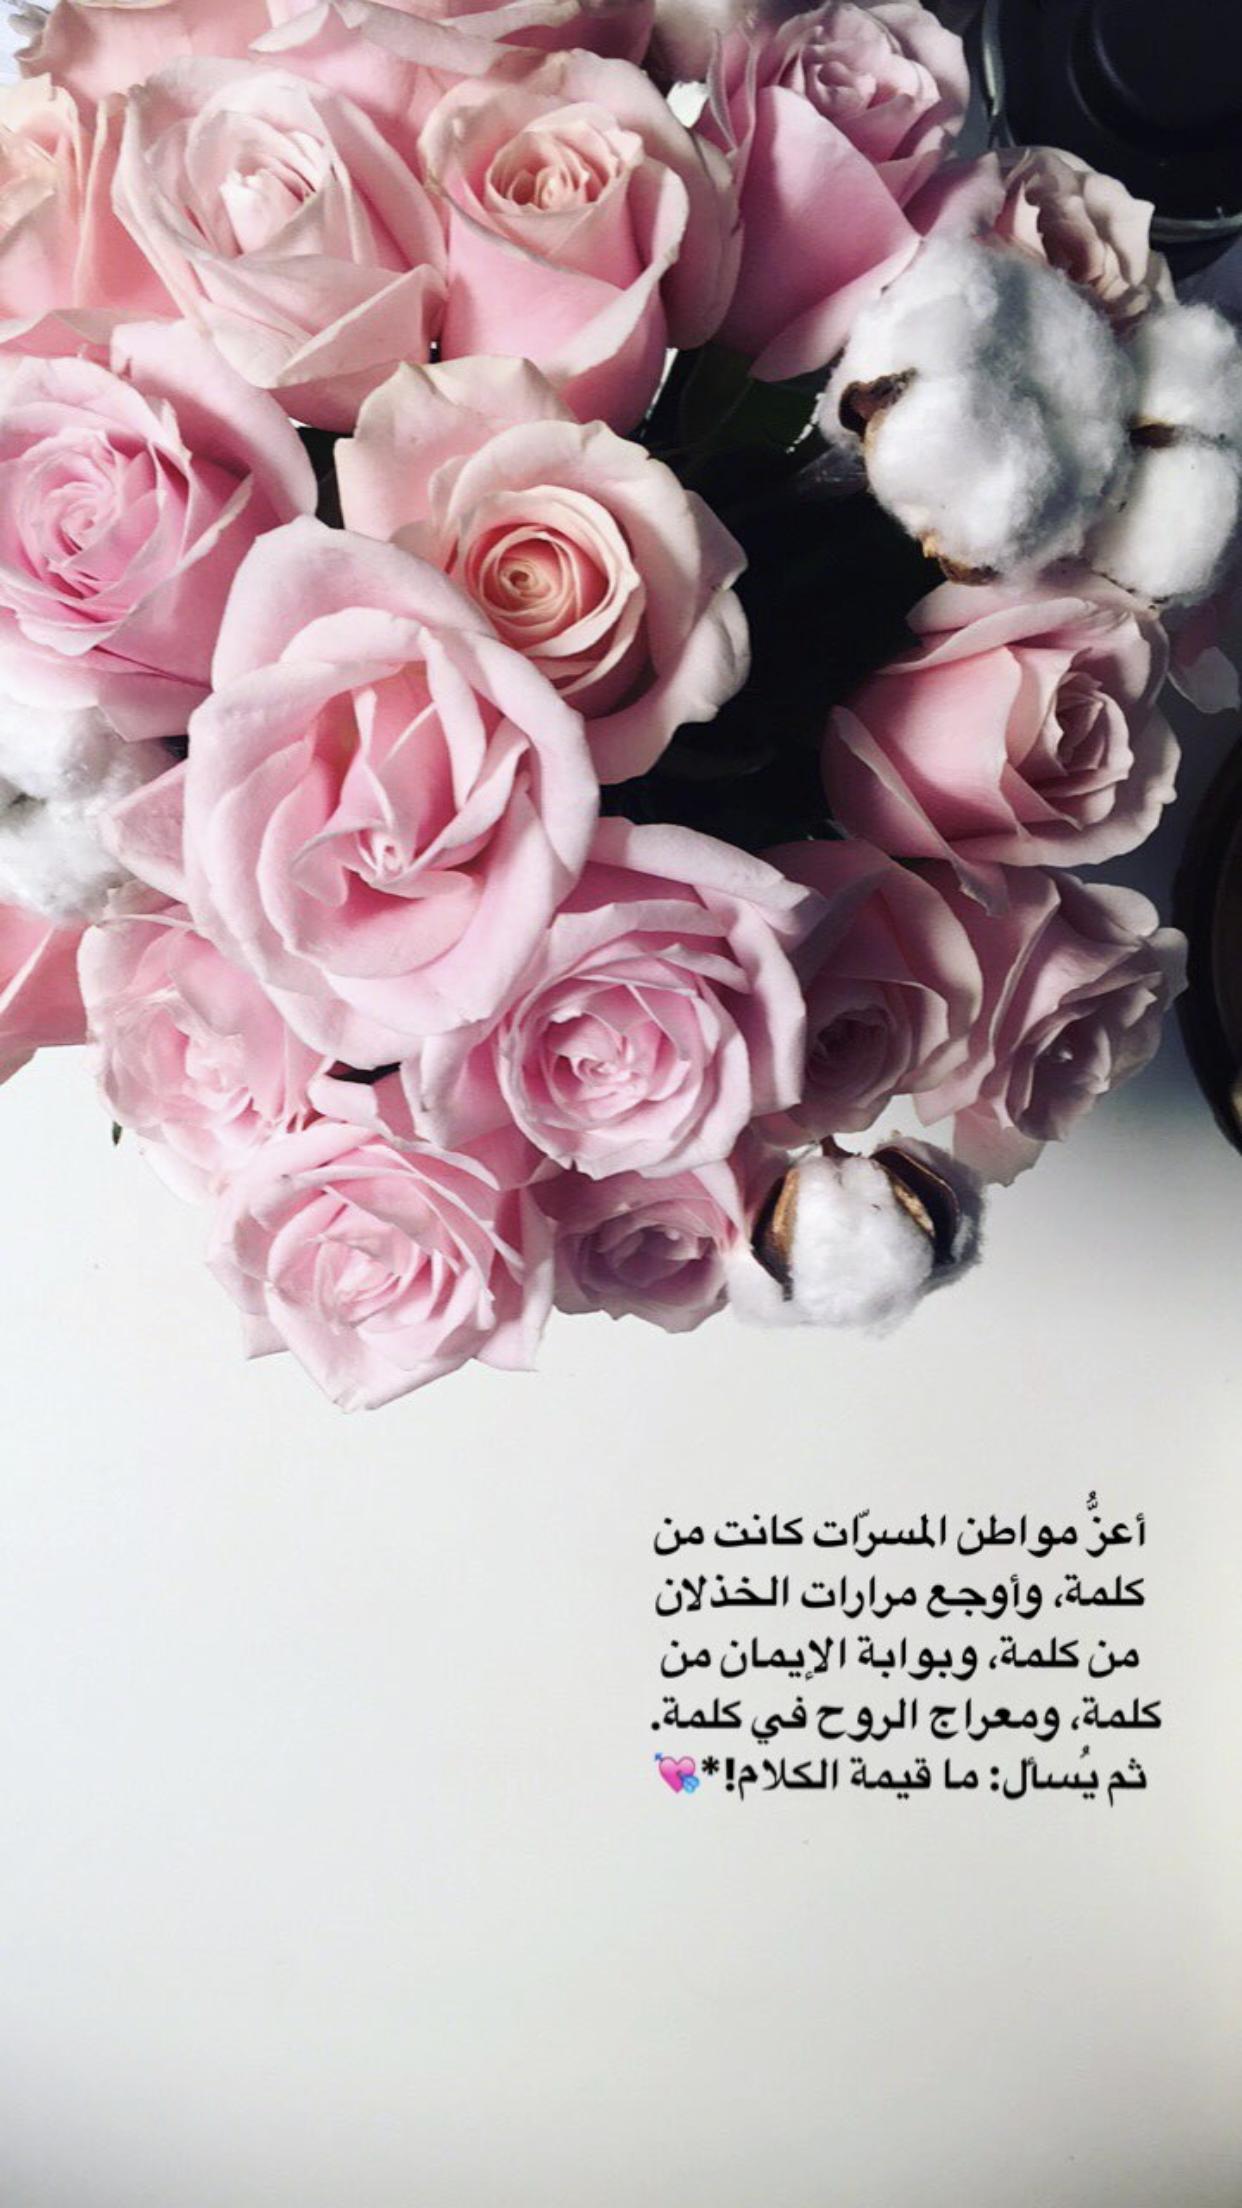 Pin By موضي البليهد On سناب موضي البليهد Allah Rose Love